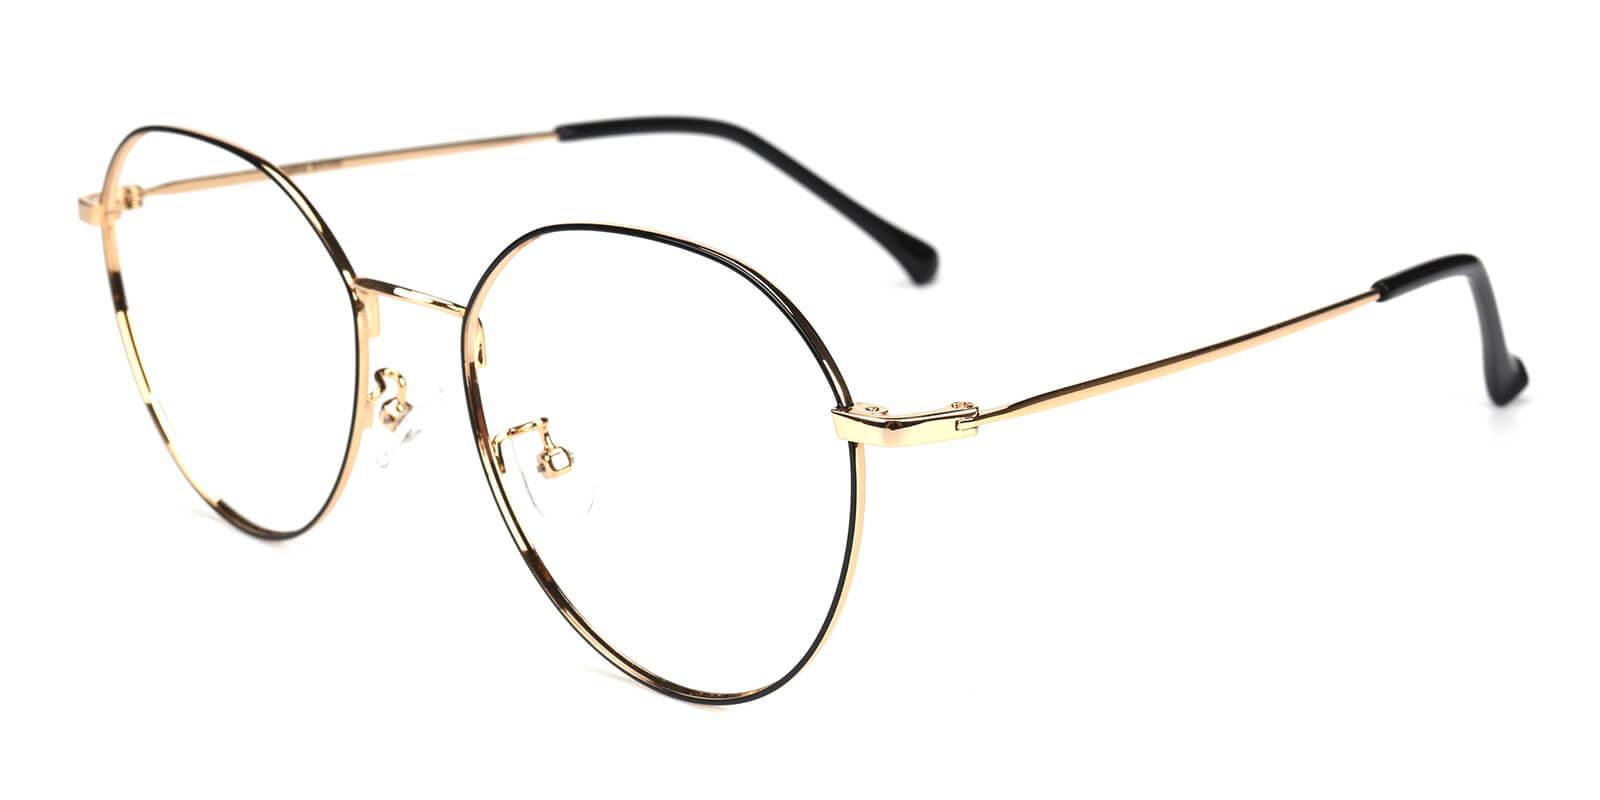 Maya-Multicolor-Round-Metal-Eyeglasses-additional1